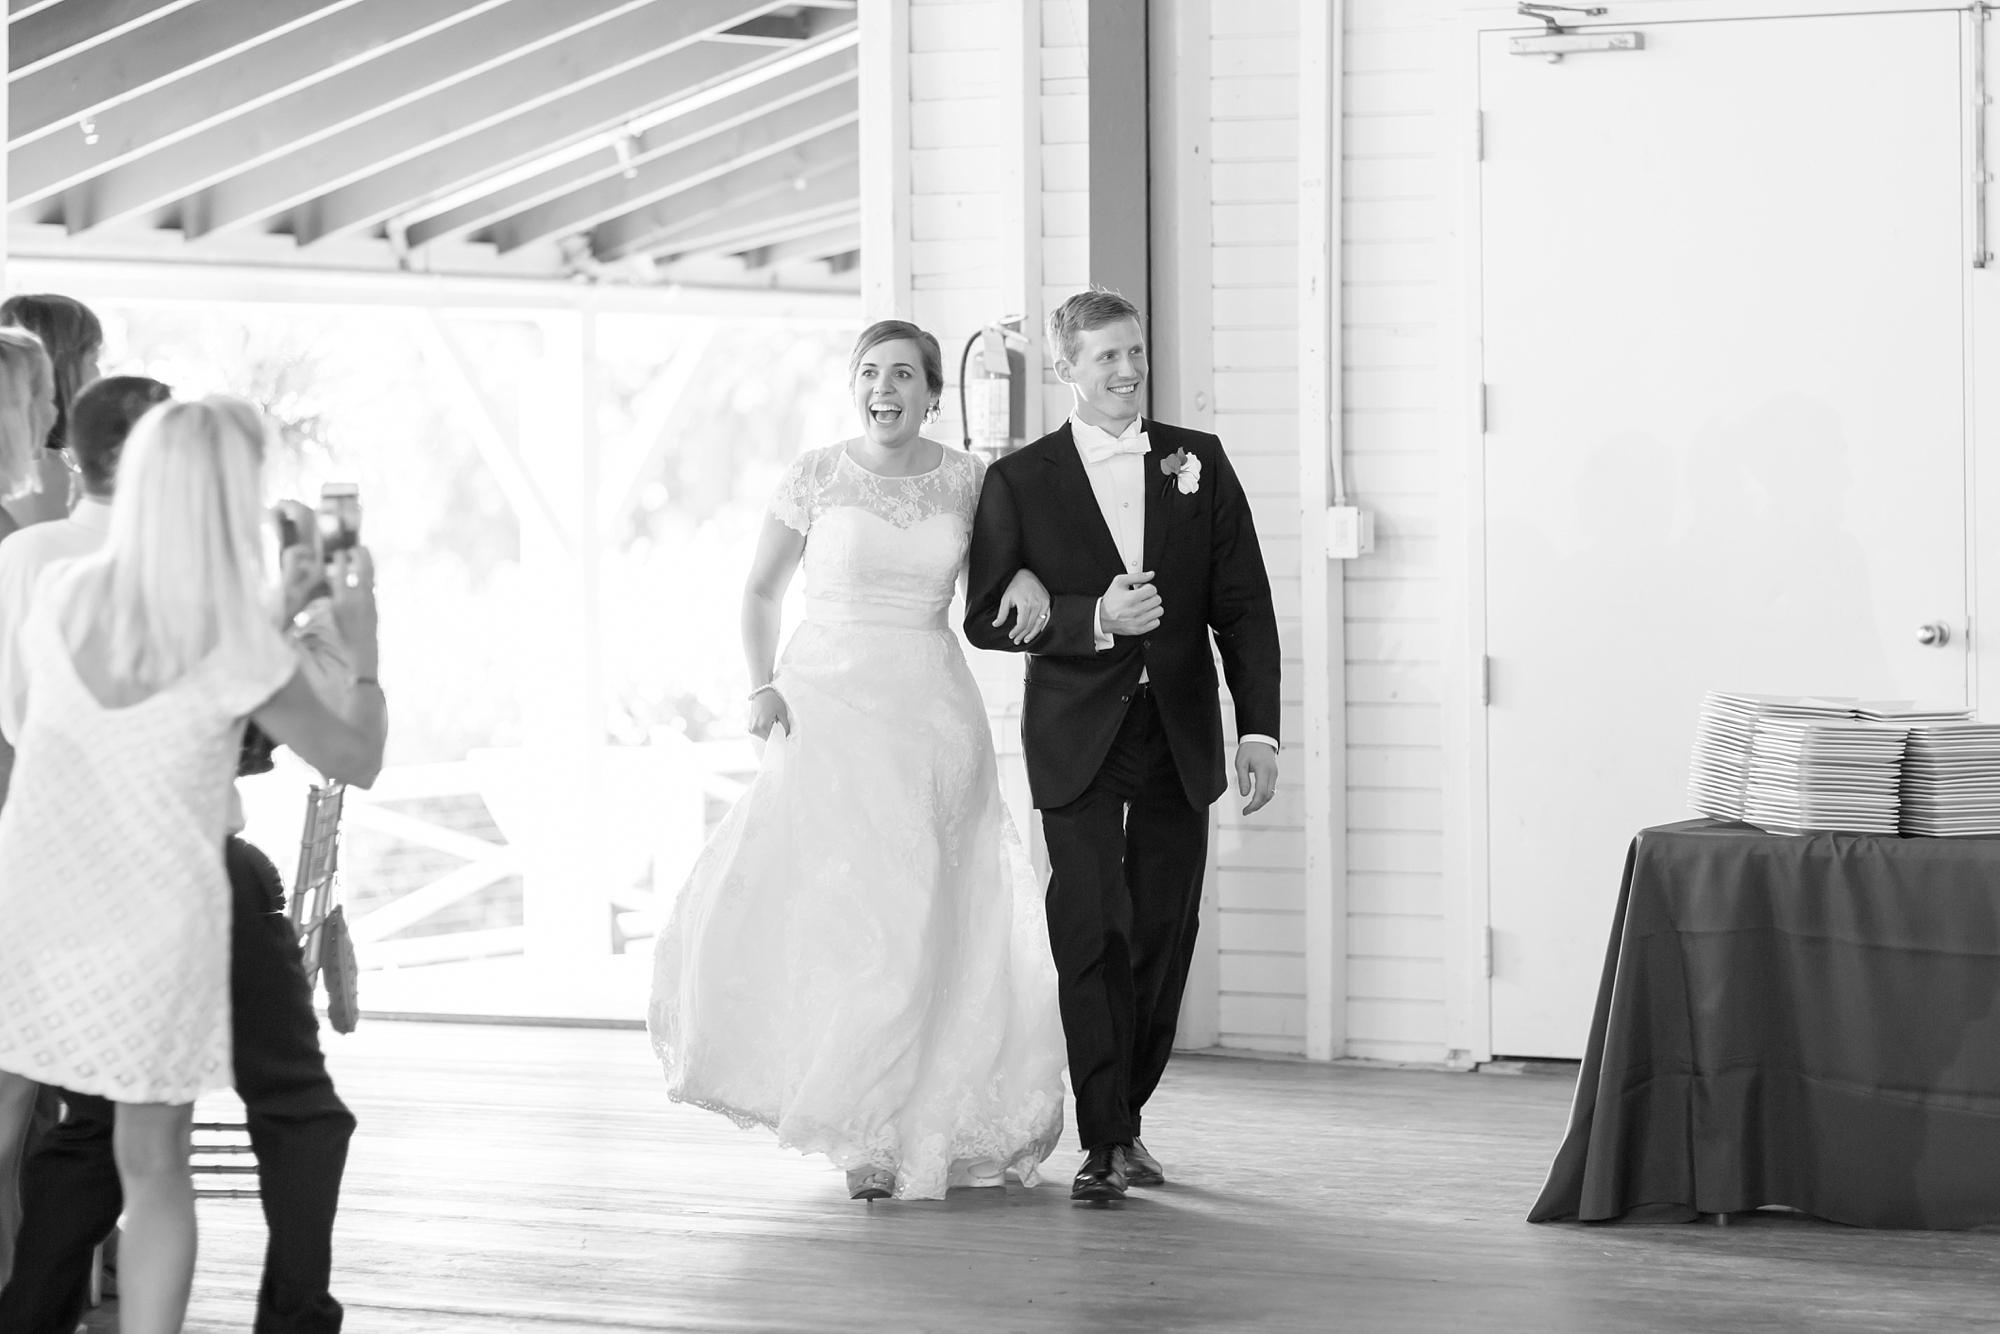 Somerville 6-Reception-186_anna grace photography sherwood forest annapolis maryland wedding photographer photo.jpg